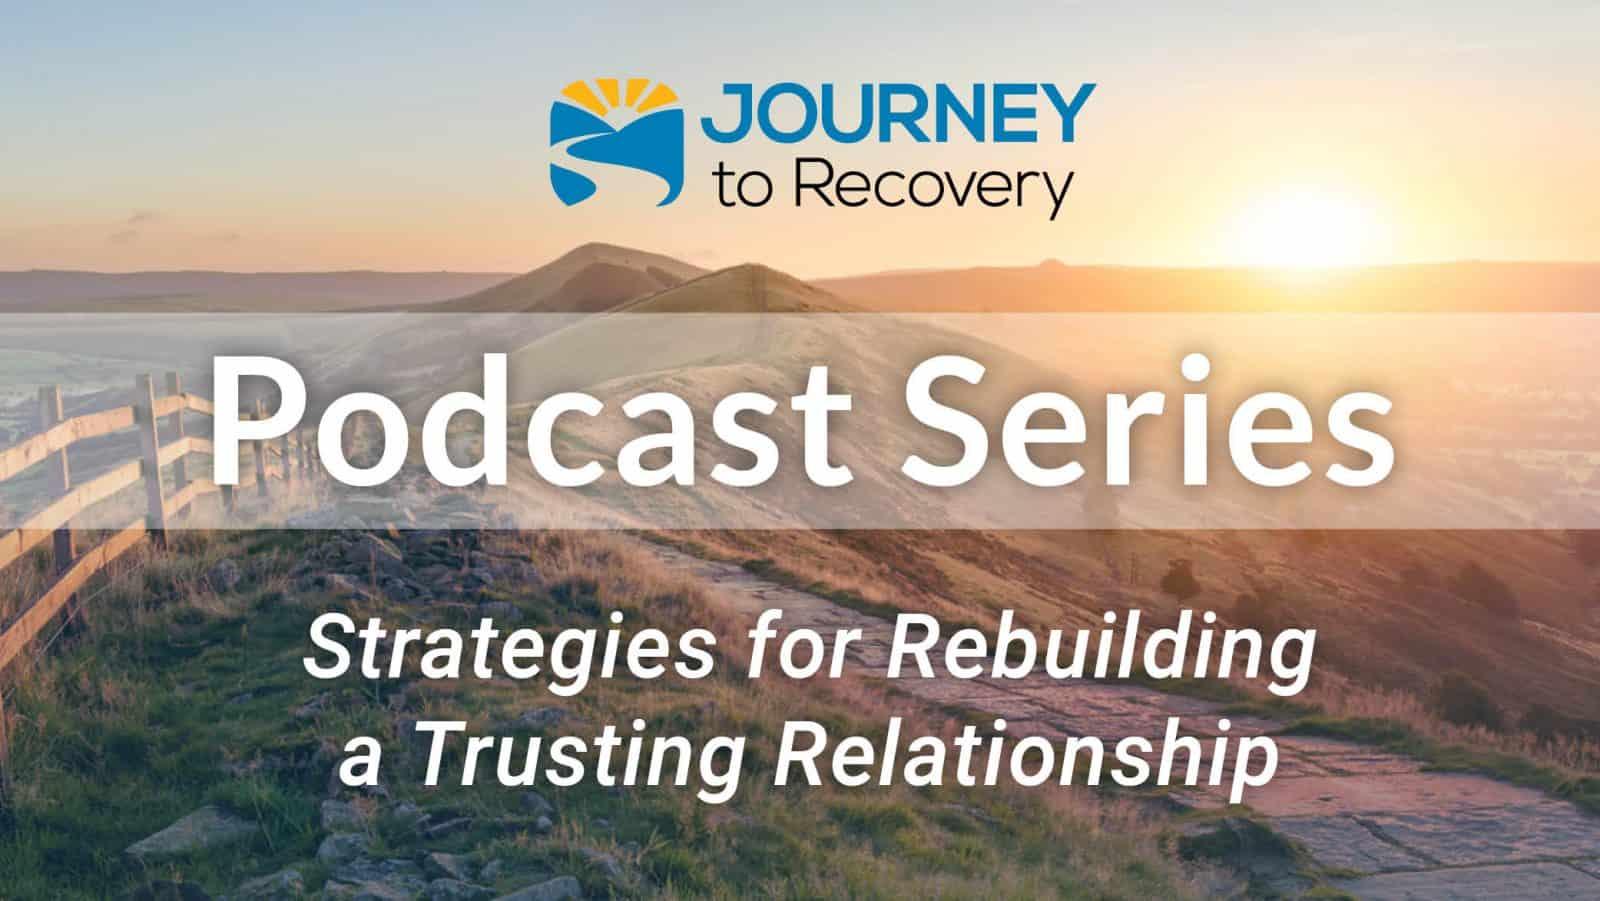 Strategies for Rebuilding a Trusting Relationship